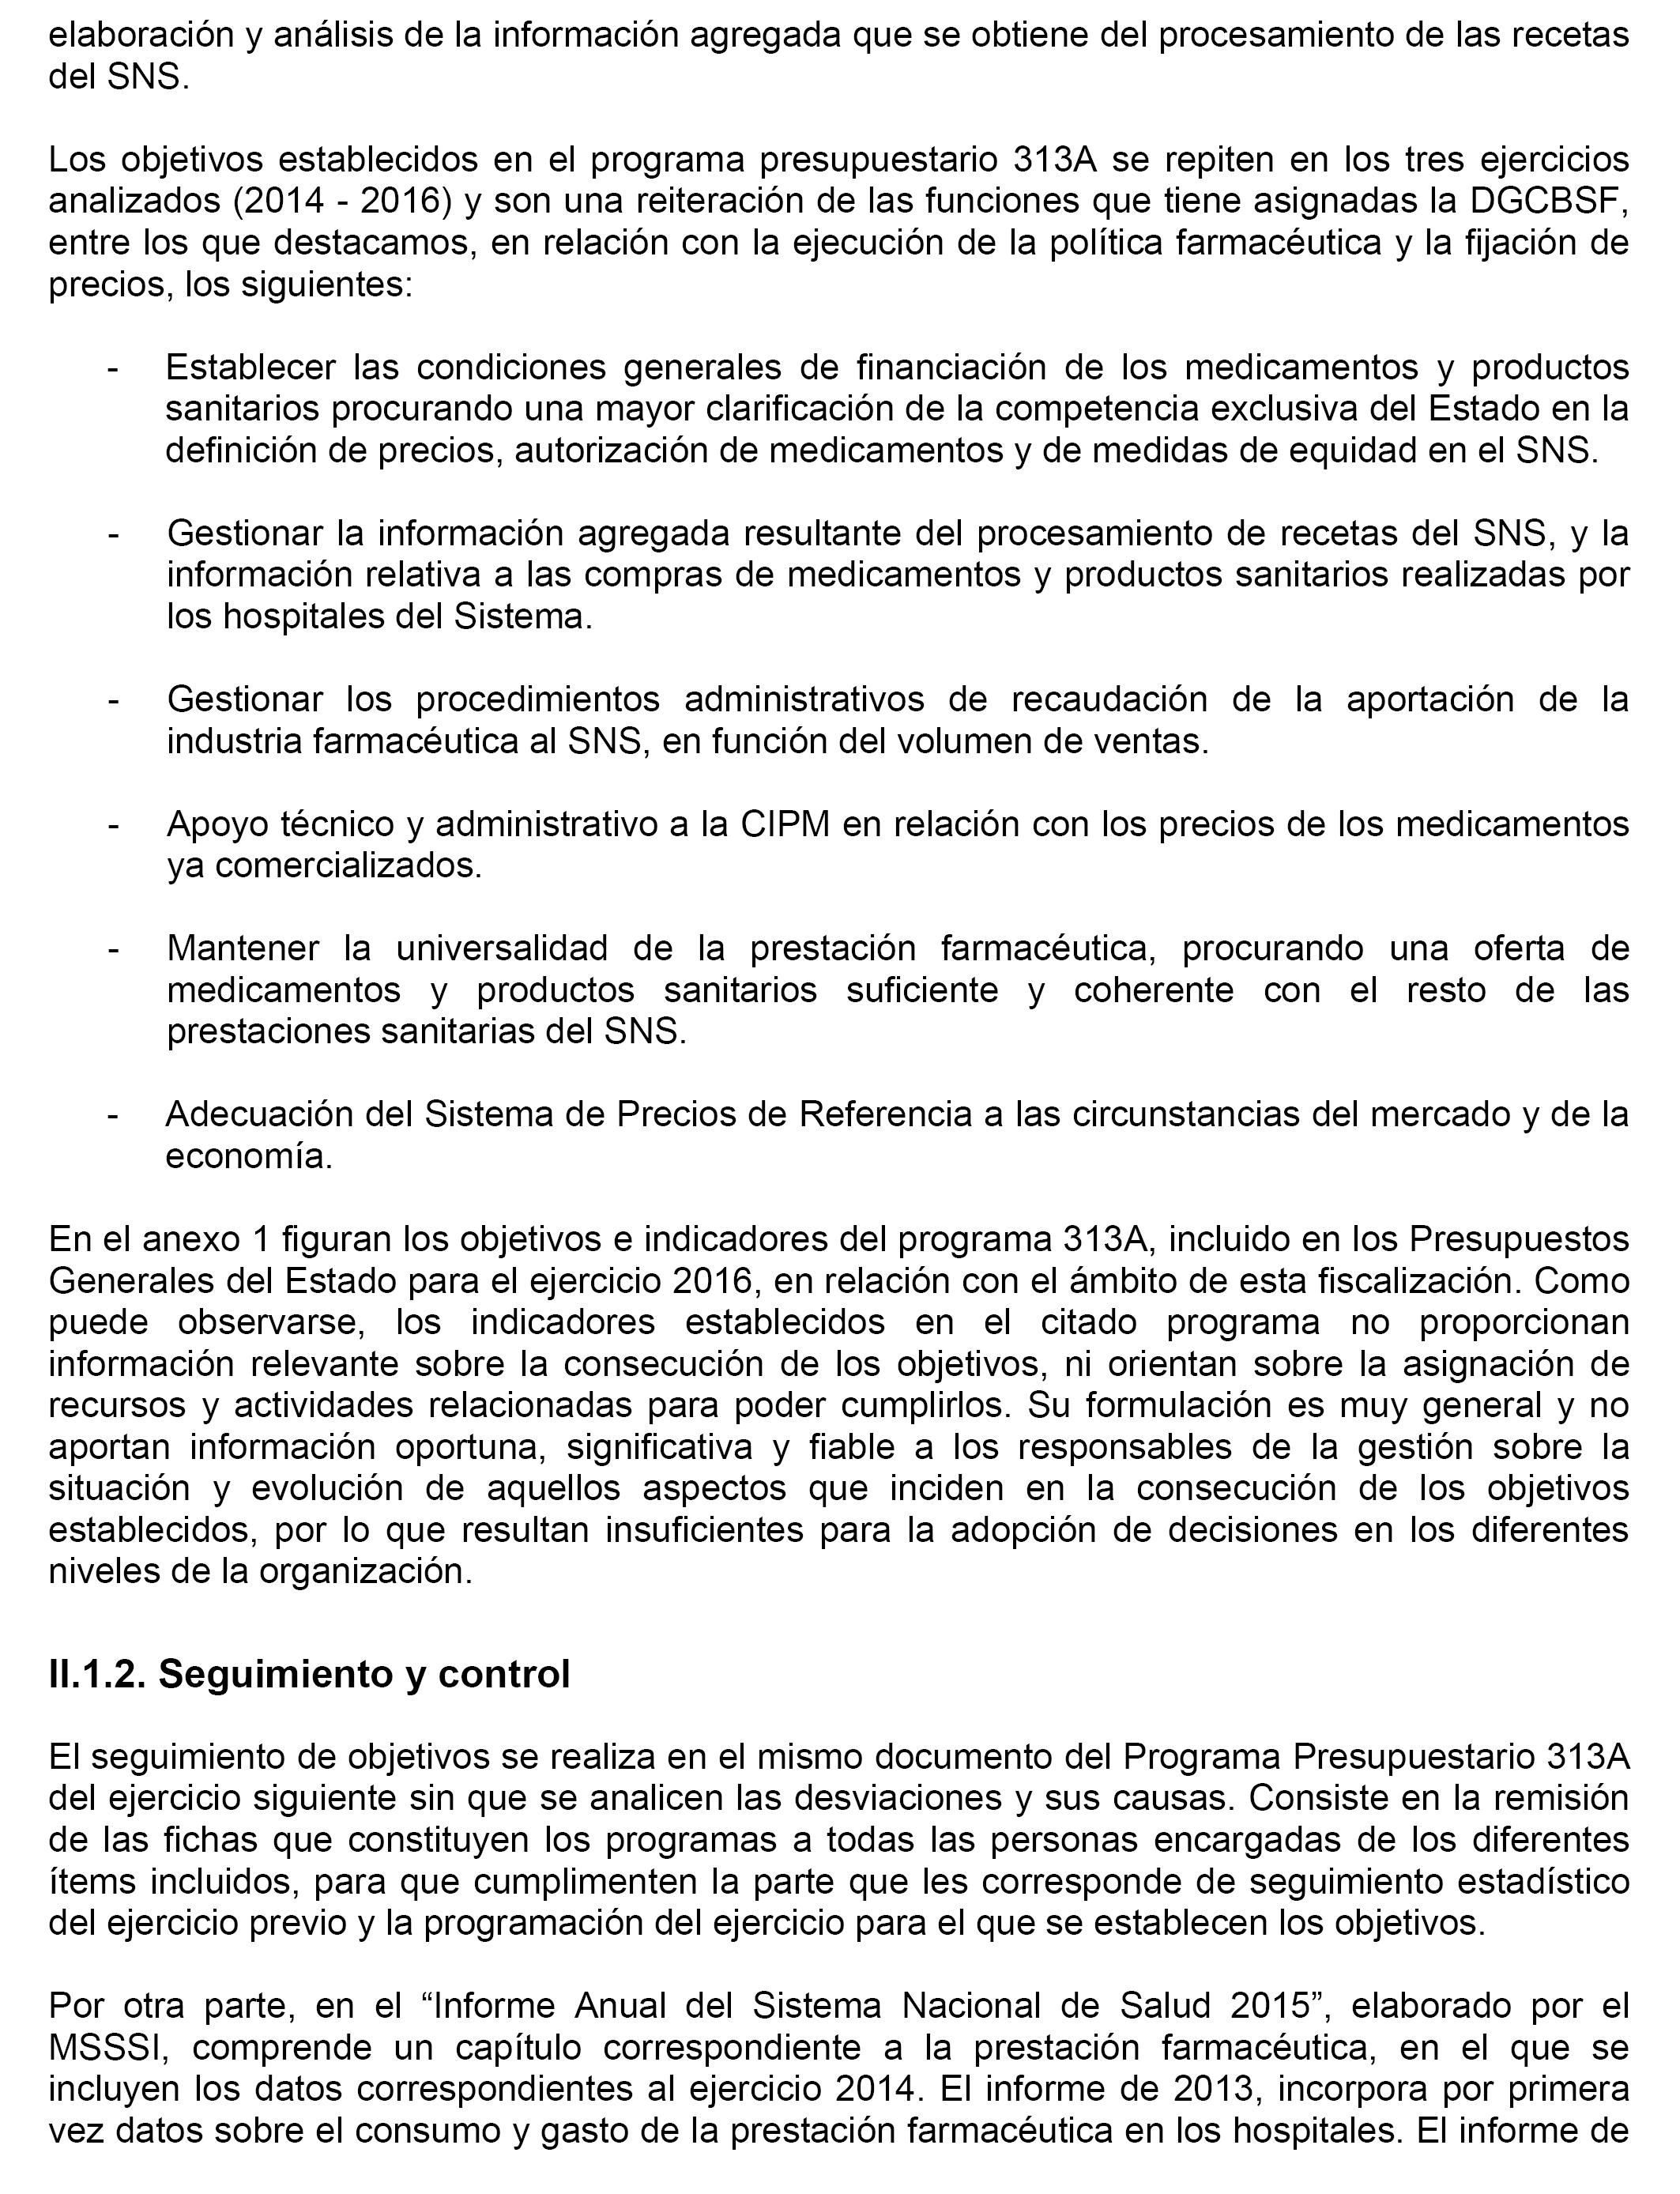 BOE.es - Documento BOE-A-2018-2581